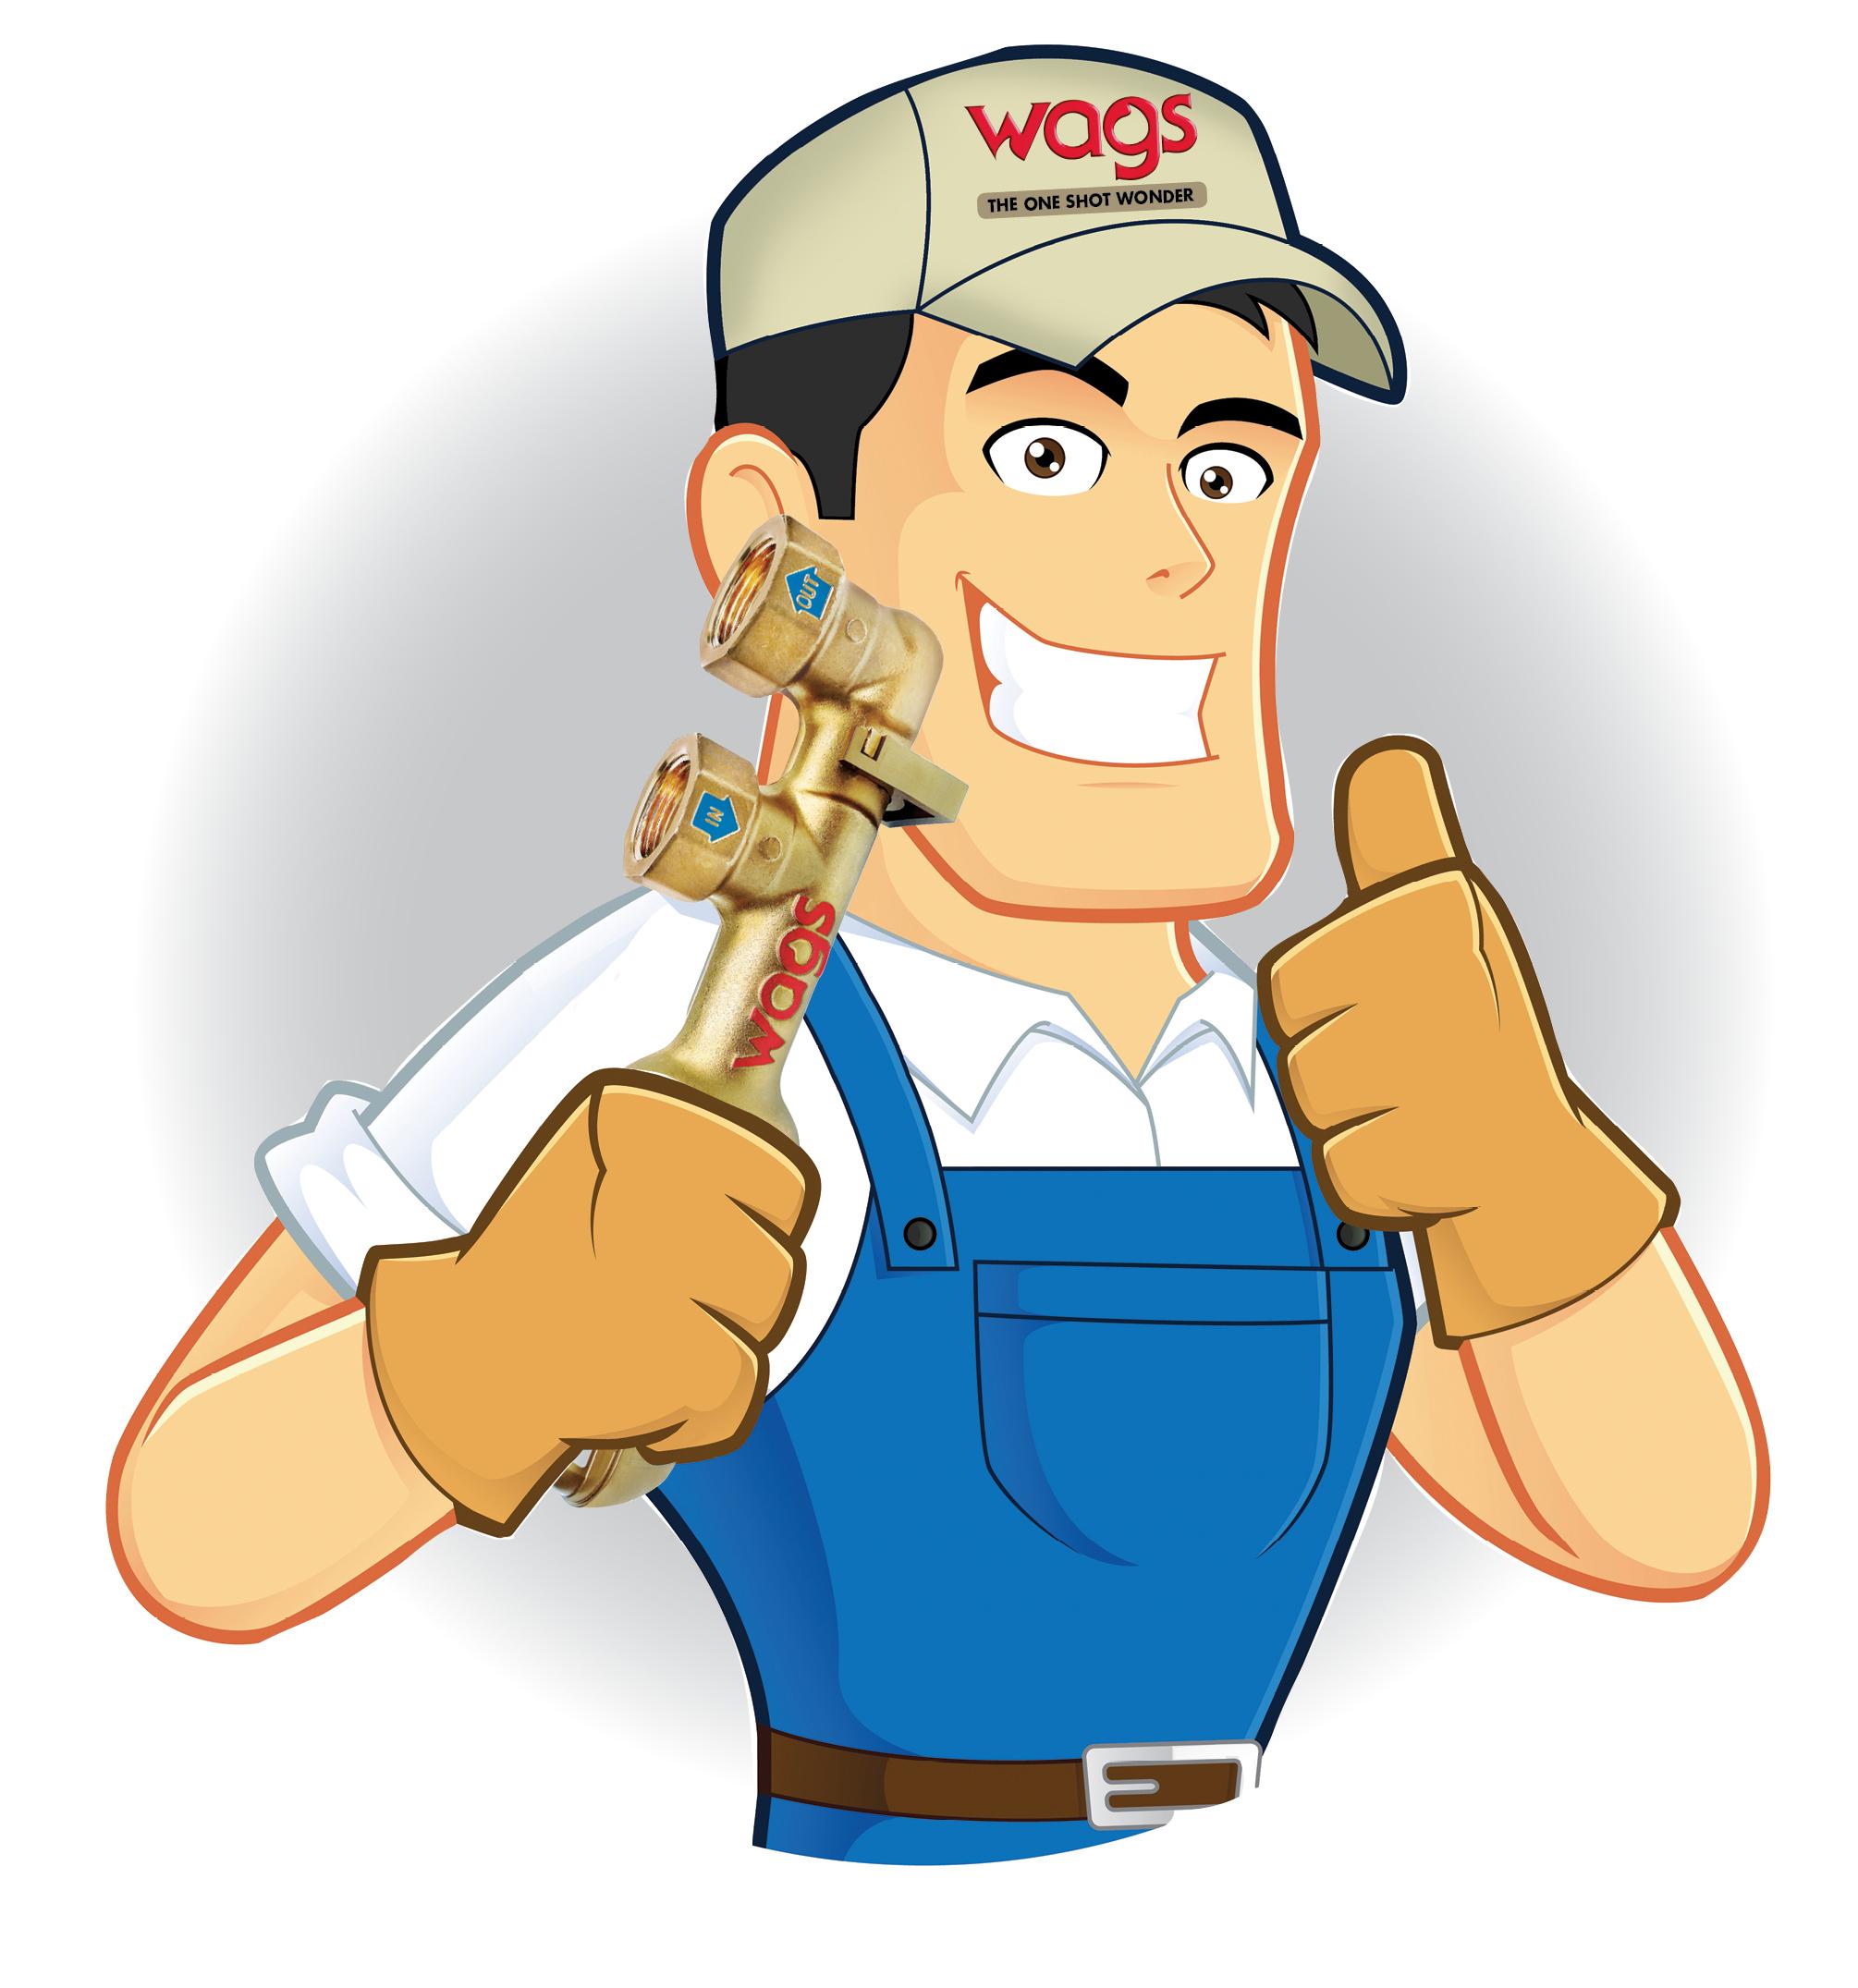 plumber-hero-art-with-wags-valve.jpg